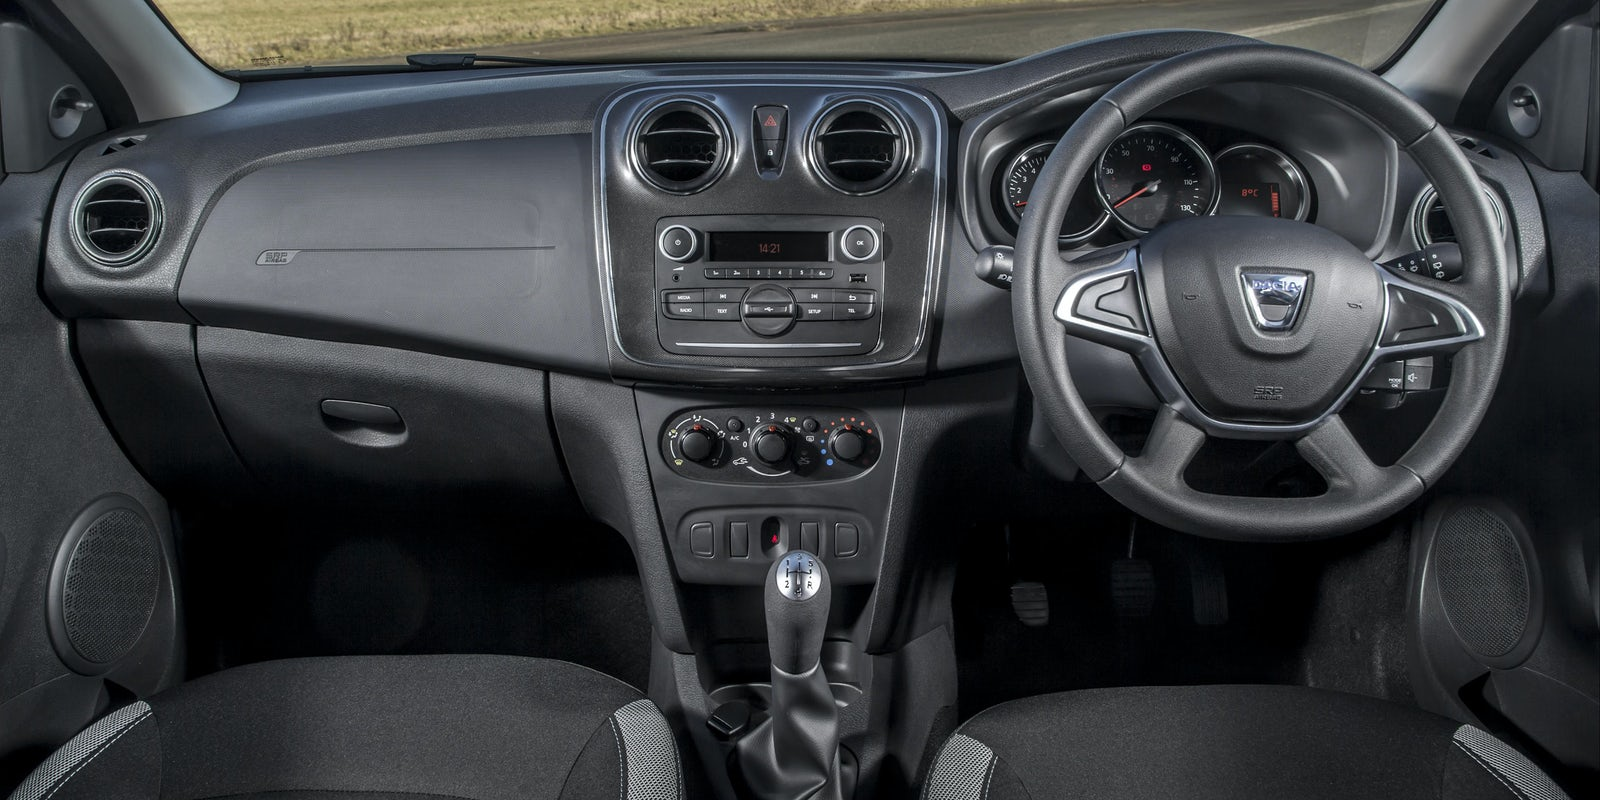 Dacia Sandero Stepway Interior & Infotainment | carwow